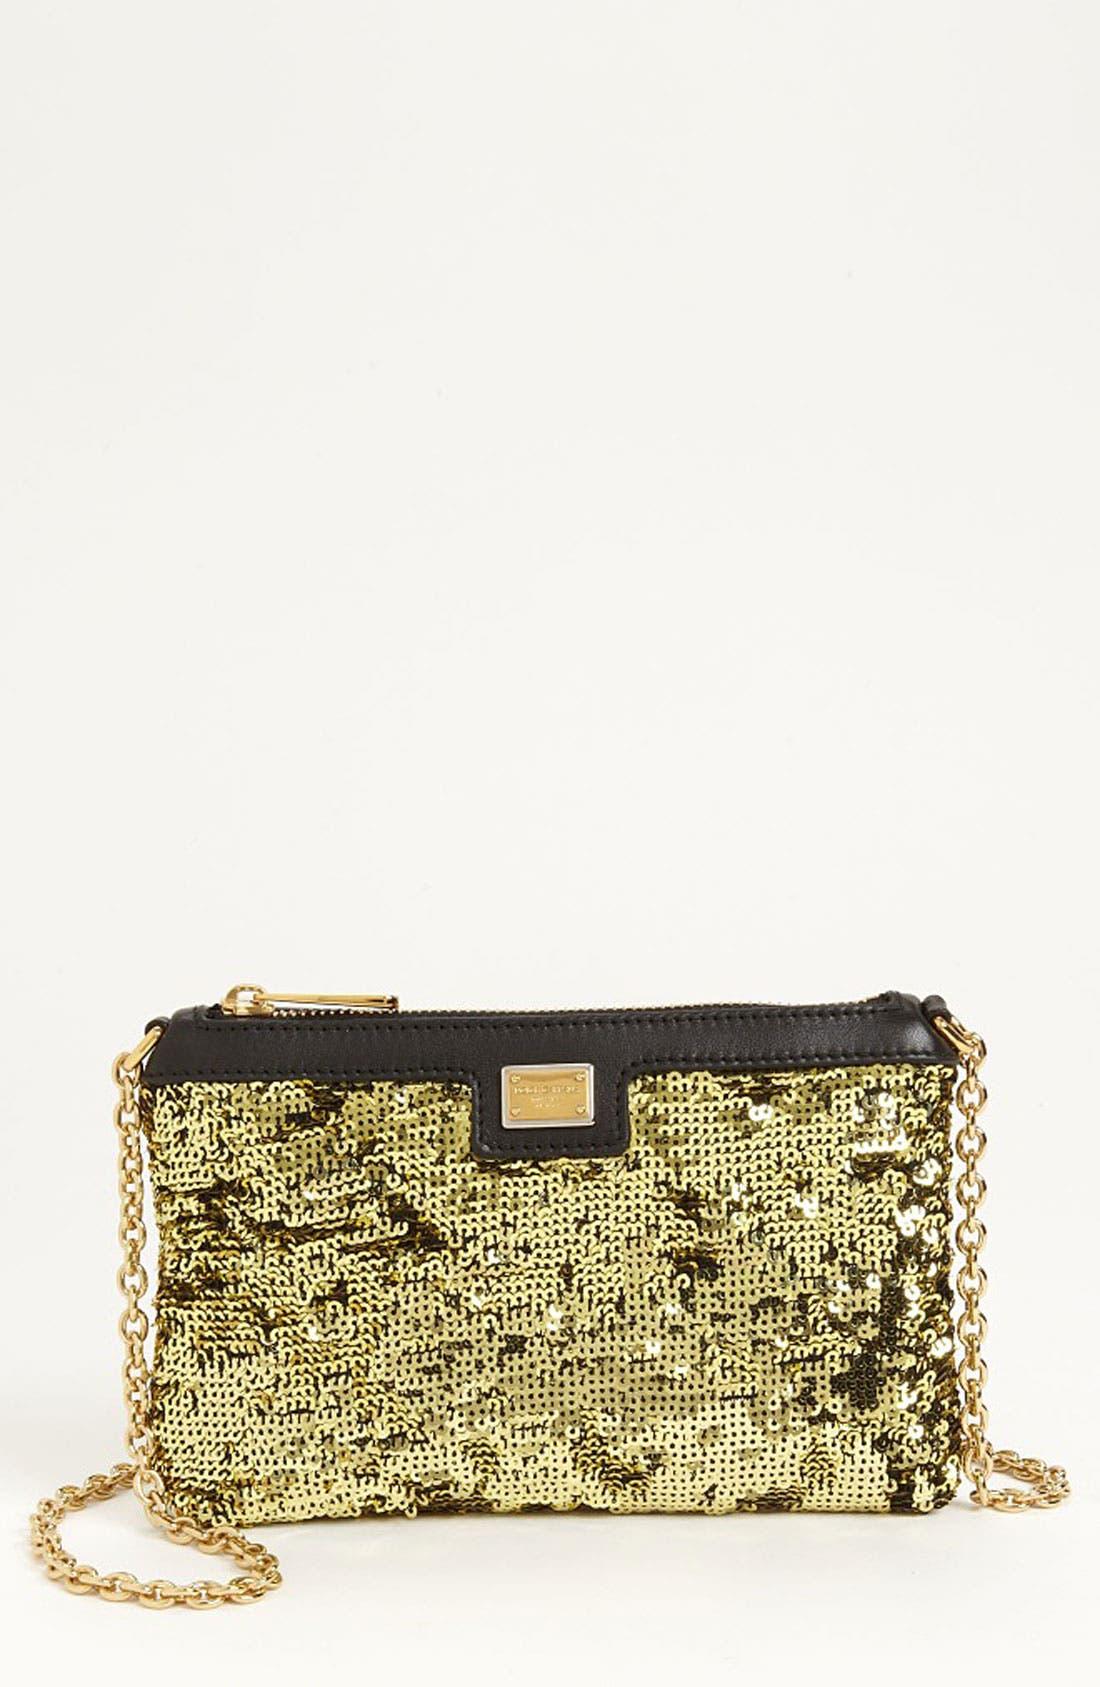 Alternate Image 1 Selected - Dolce&Gabbana 'Miss Mini' Sequin Crossbody Bag